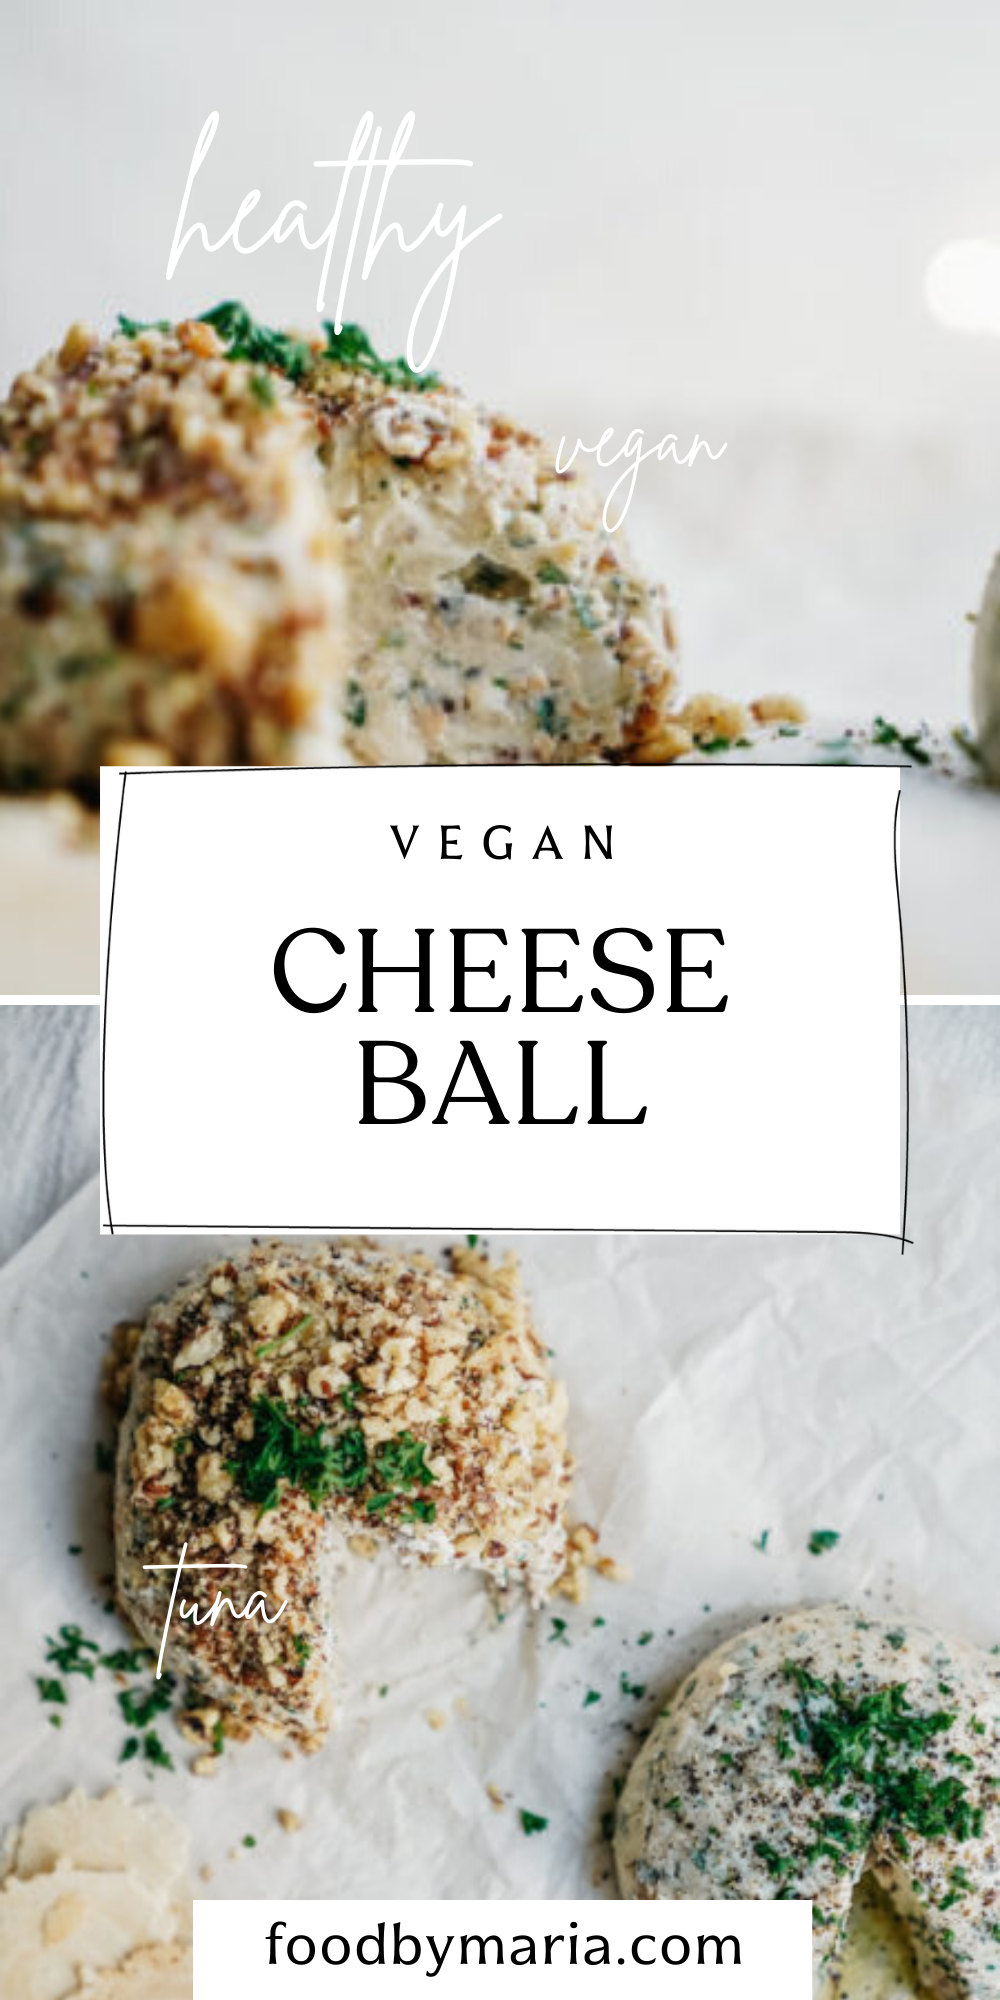 The Best Tuna Vegan Cheese Ball Foodbymaria Recipes Recipe In 2020 Vegan Cheese Healthy Snacks Recipes Healthy Vegan Snacks